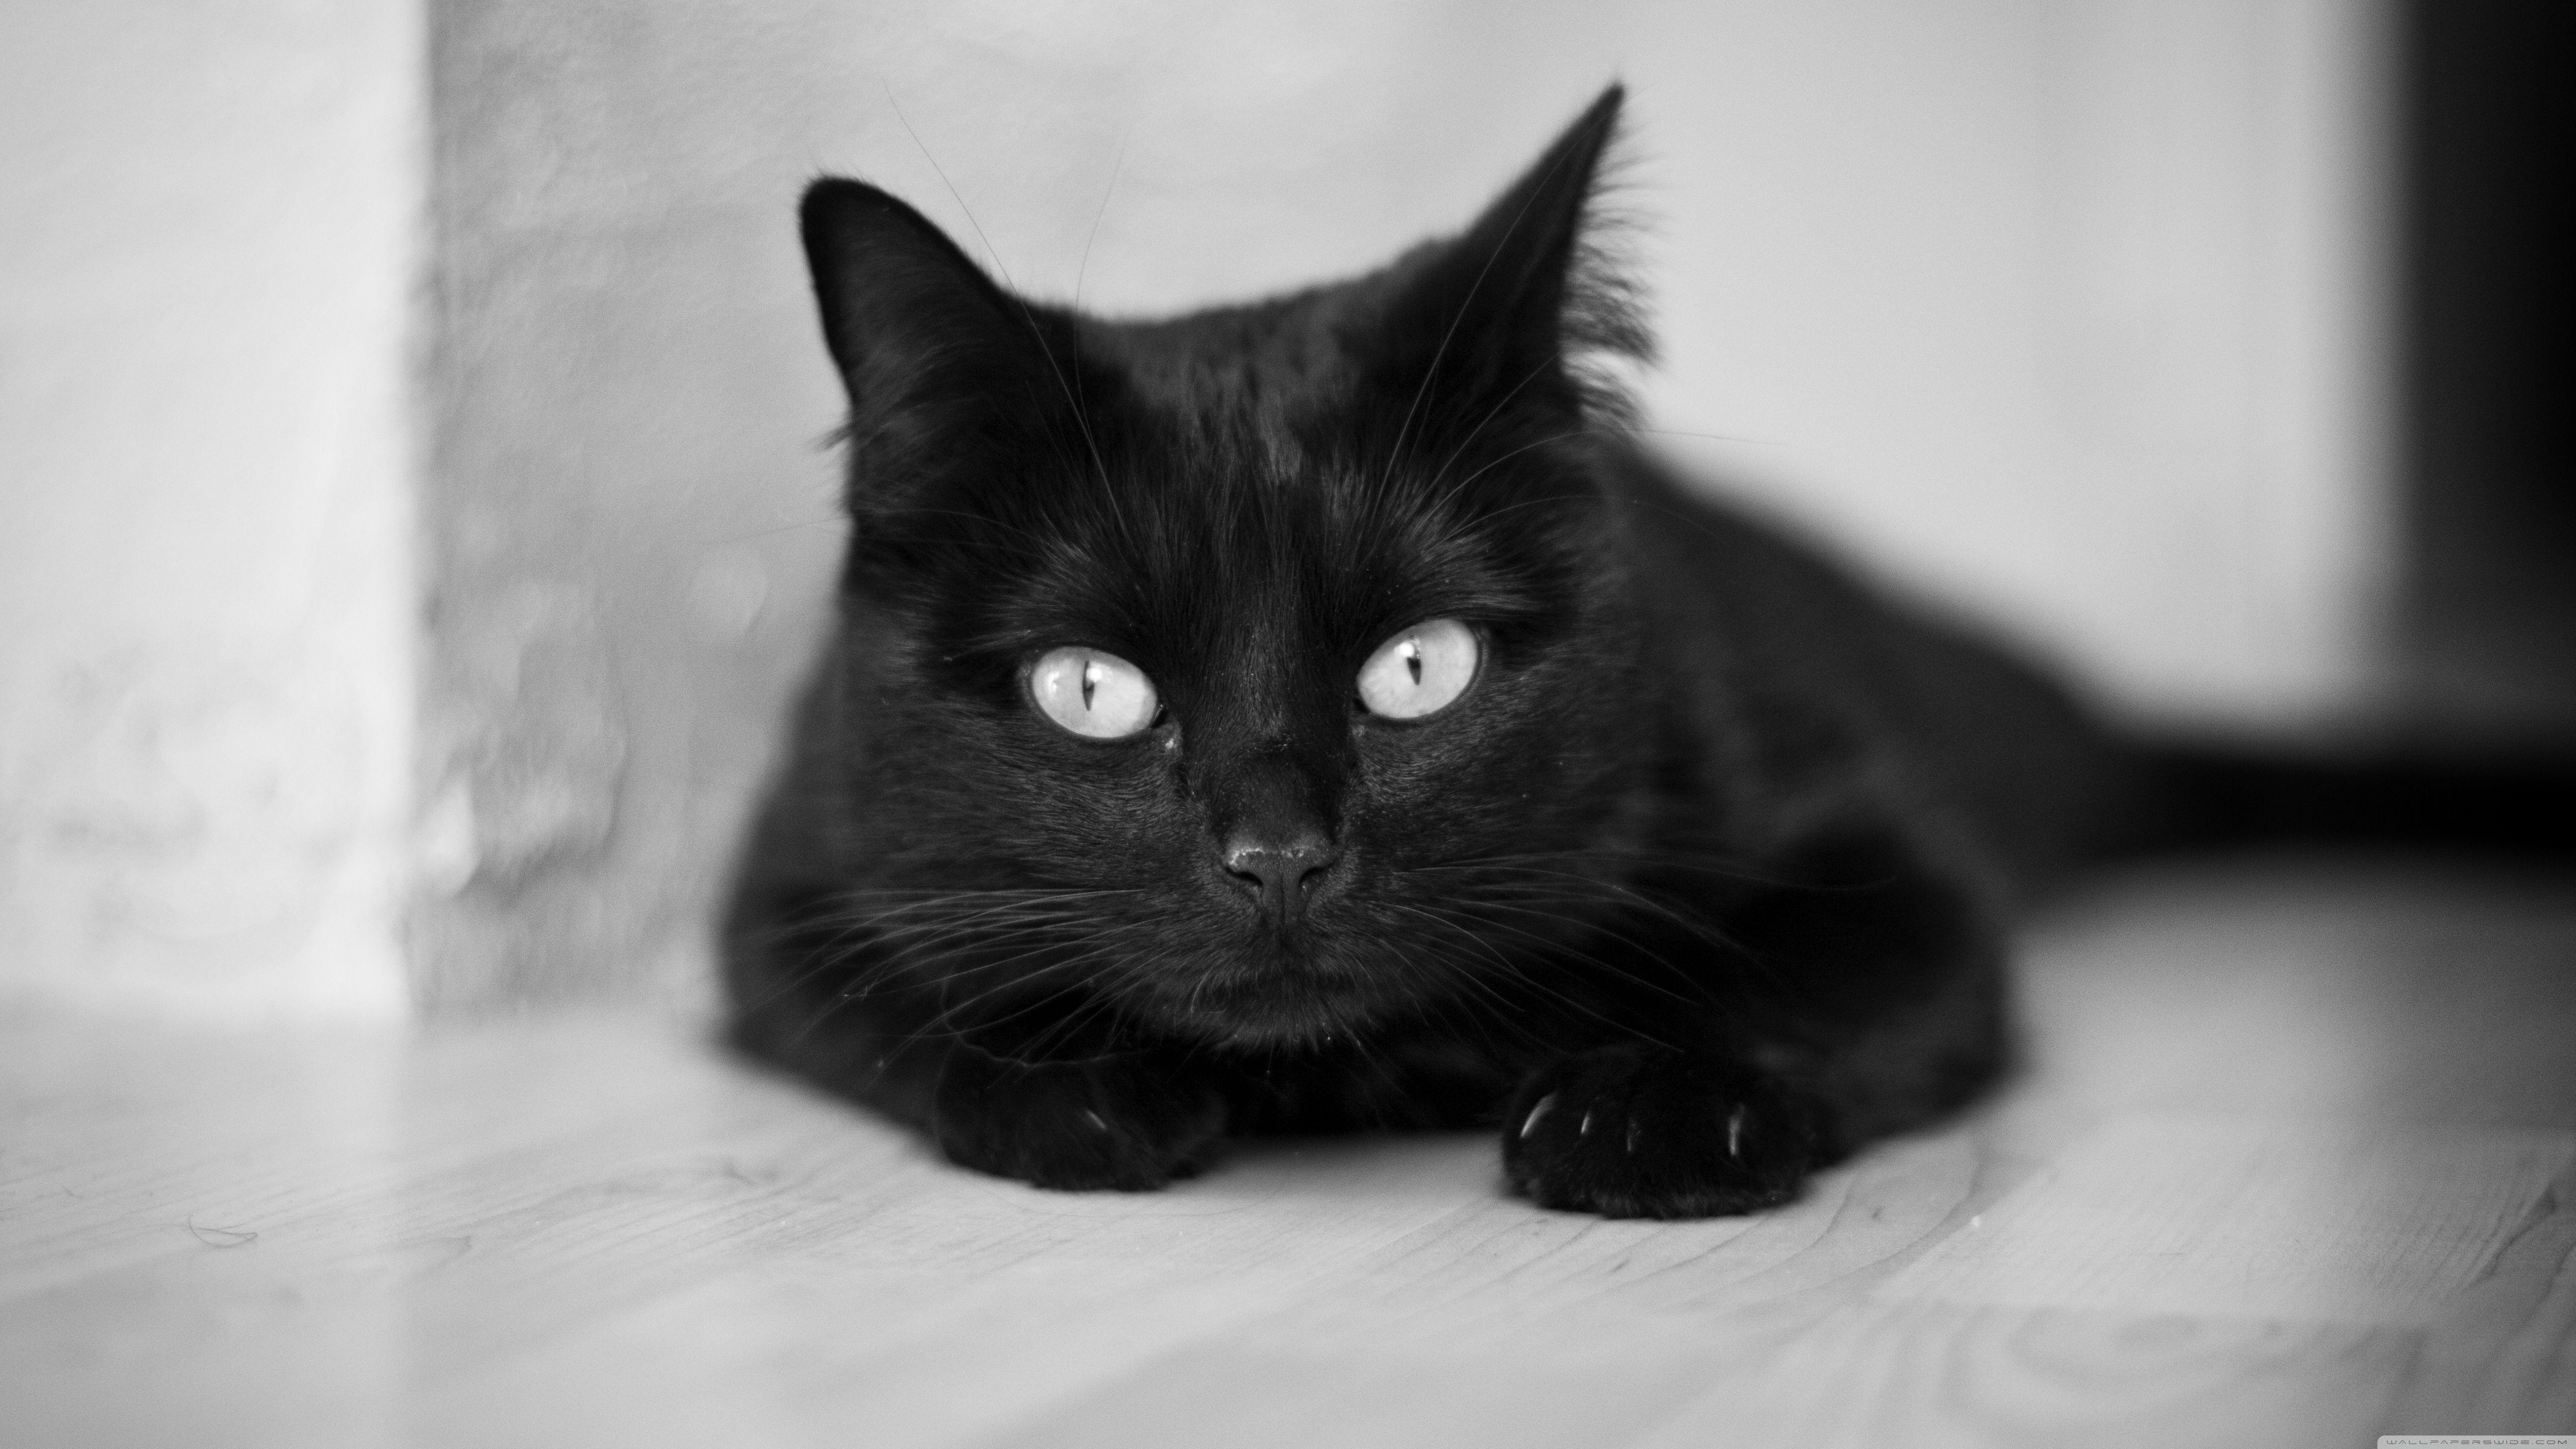 5120x2880 Black and White Cat ❤ 4K HD Wallpaper Wallpaper لتلفزيون 4K Ultra HD